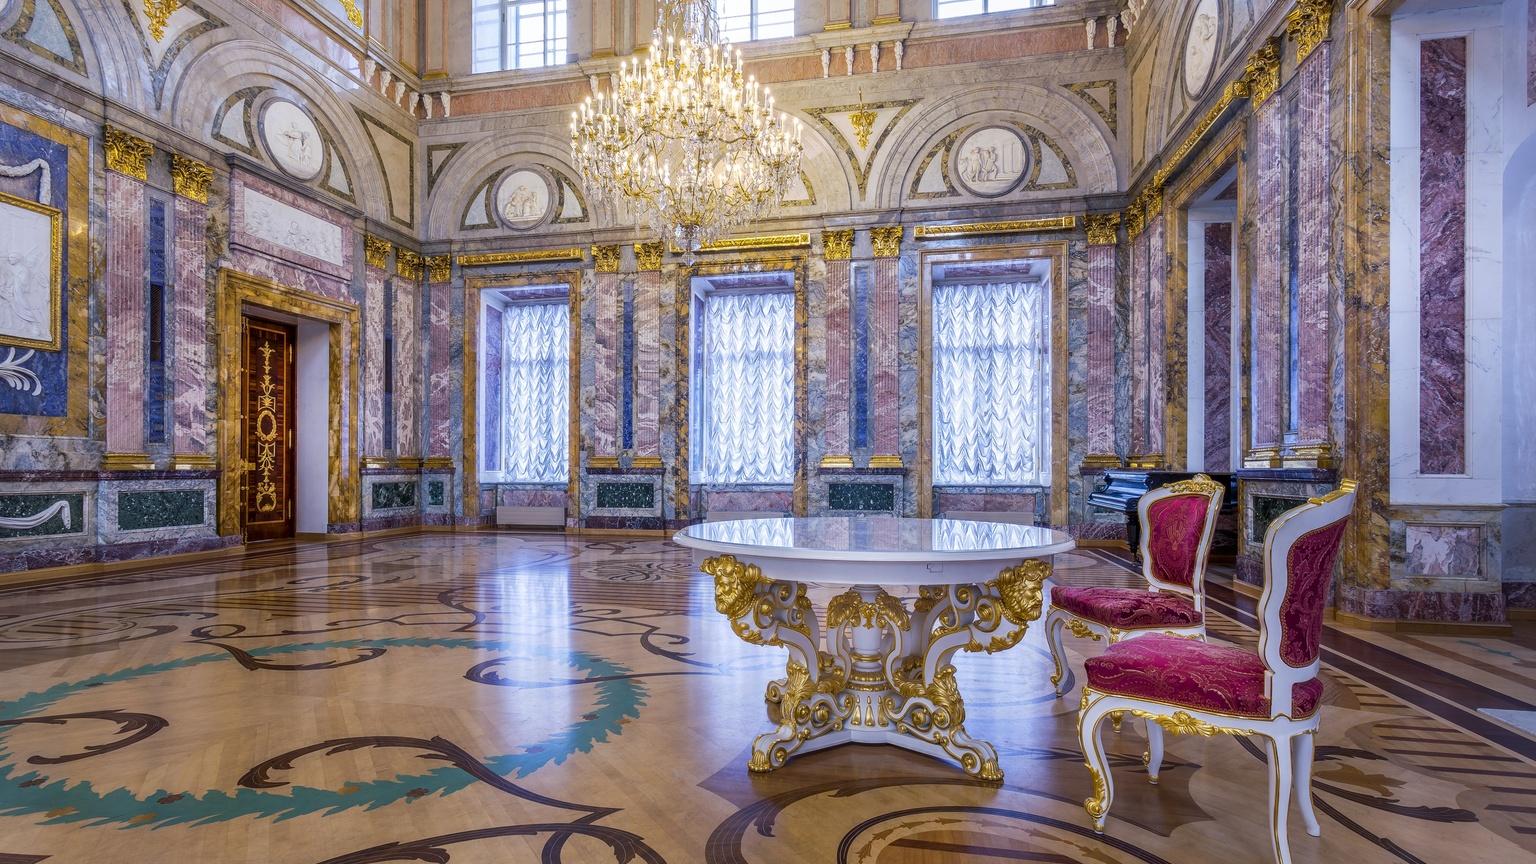 Мраморный зал в Мраморном дворце Санкт-Петербурга